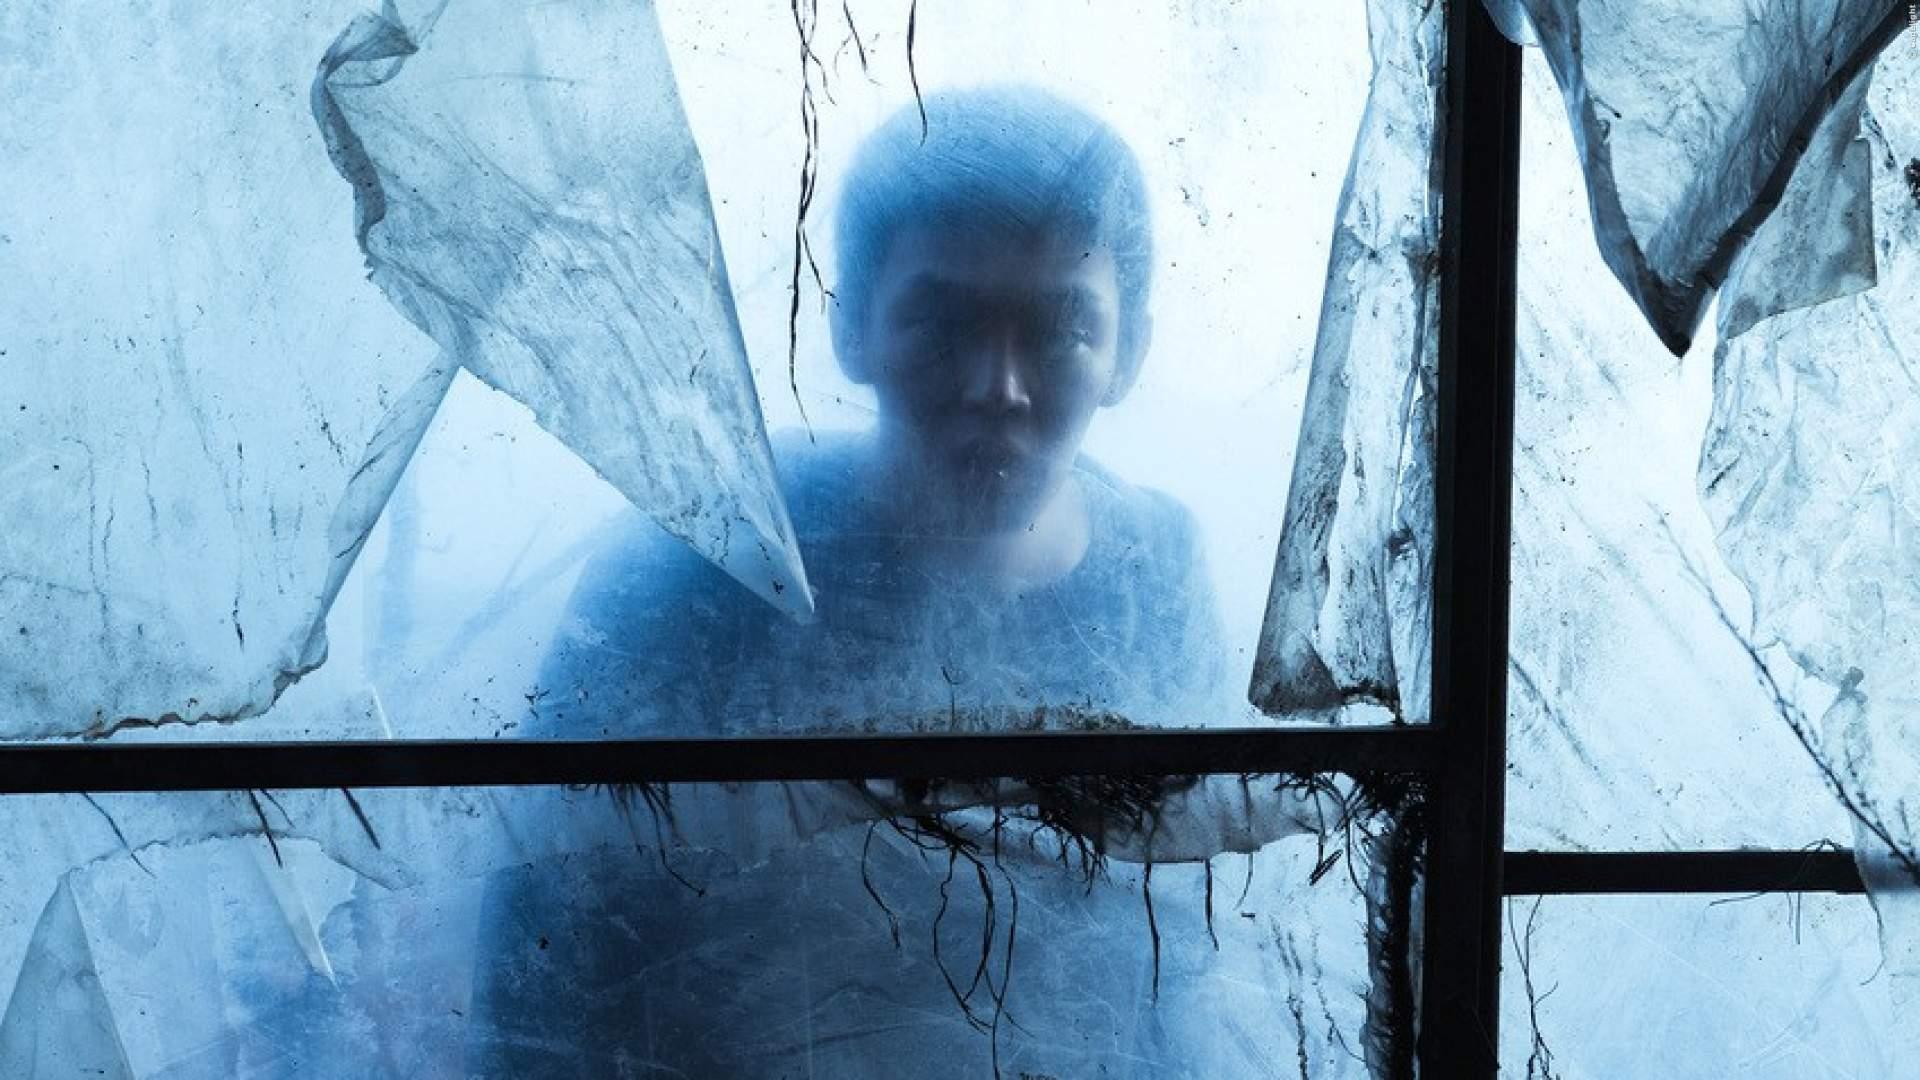 KINO-TIPP: Unheimlicher Mystery-Horror mit Steve Yeun aus 'The Walking Dead' startet im Juni